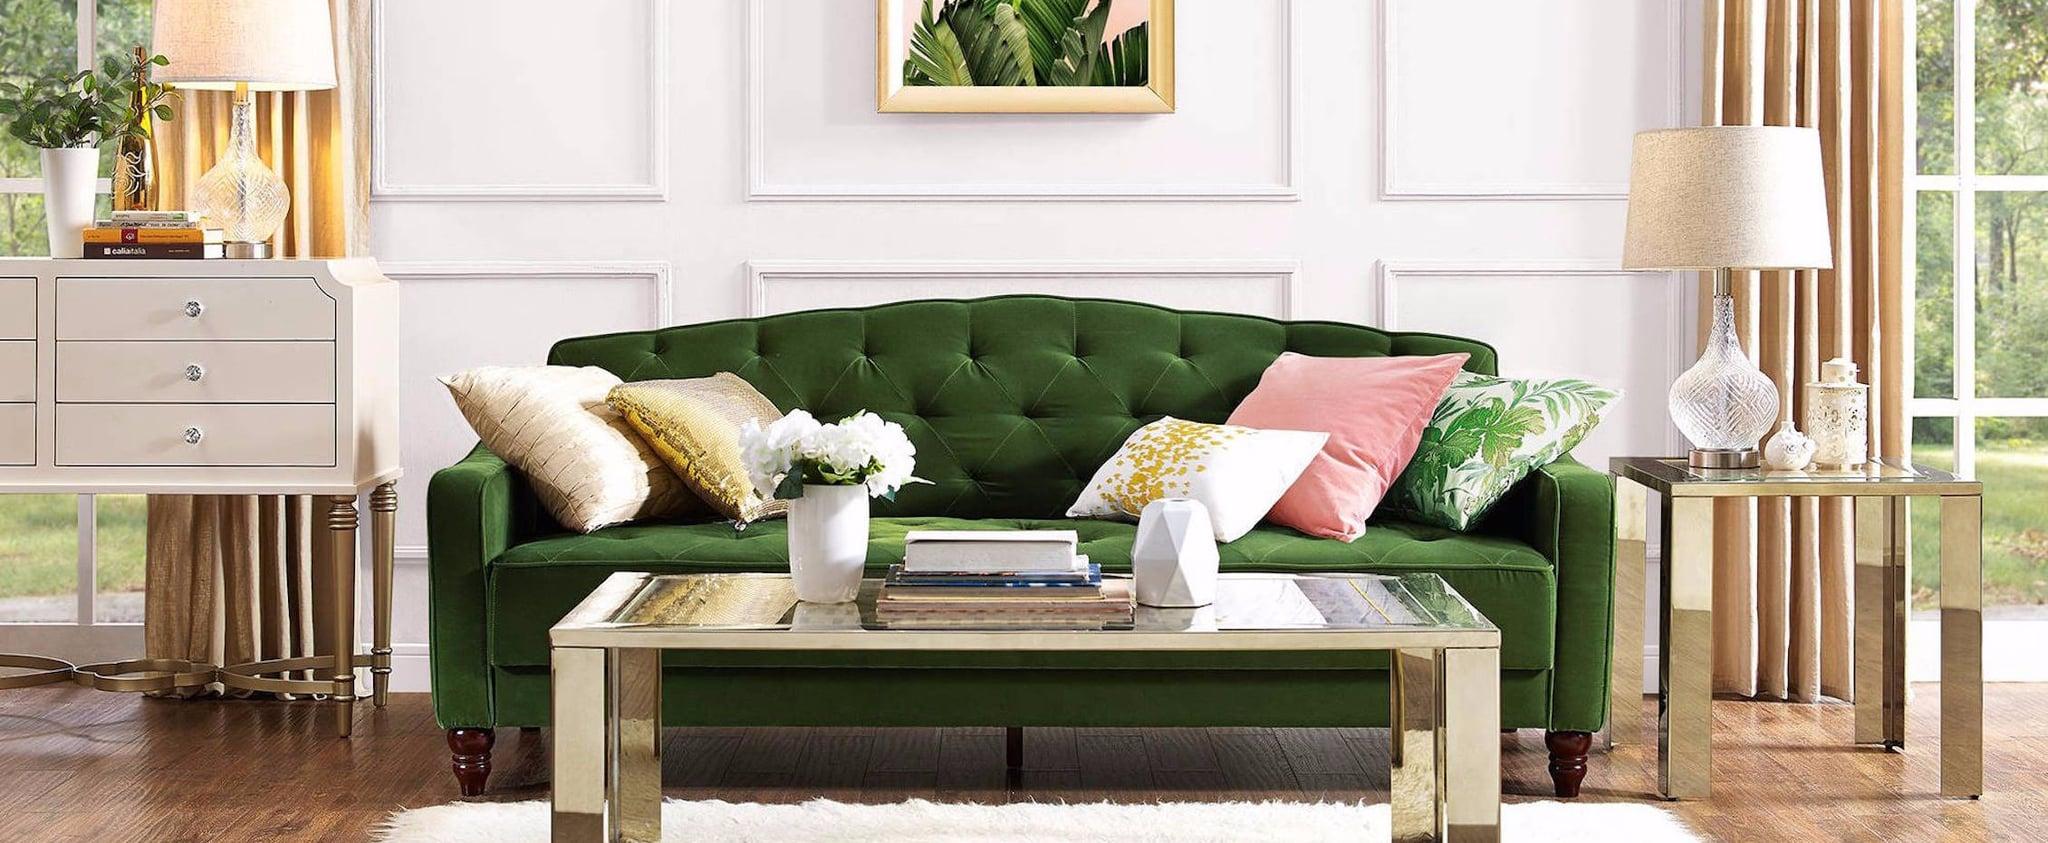 Novogratz Vintage Tufted Sofa Sleeper Review